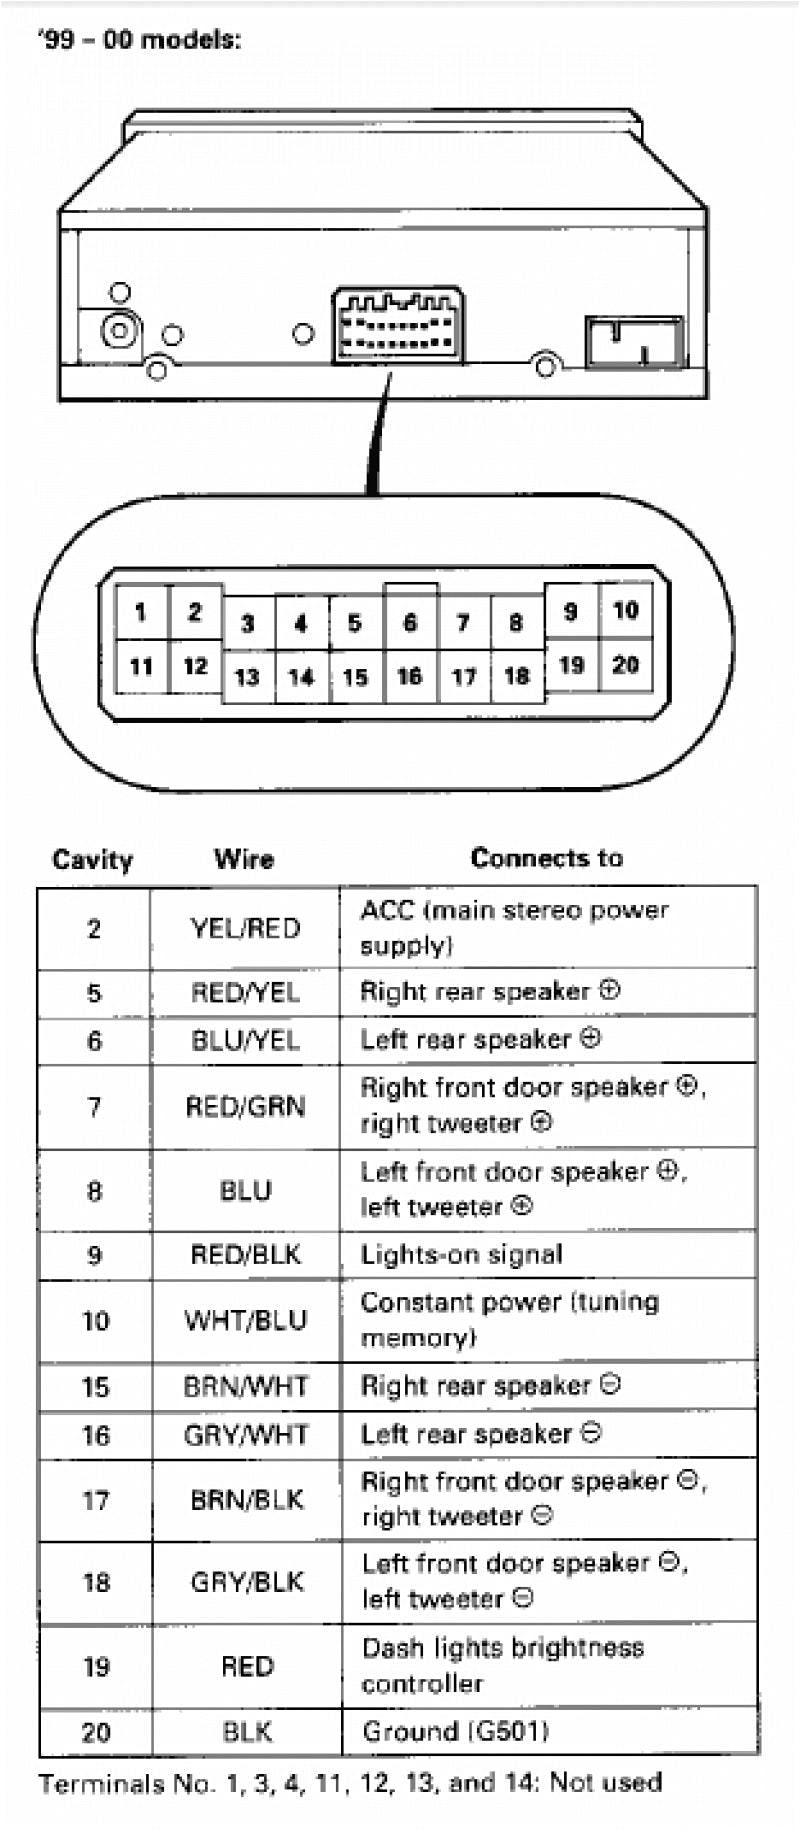 2003 Honda Civic Stereo Wiring Diagram Honda Radio Wiring Diagram Rain Manna19 Immofux Freiburg De